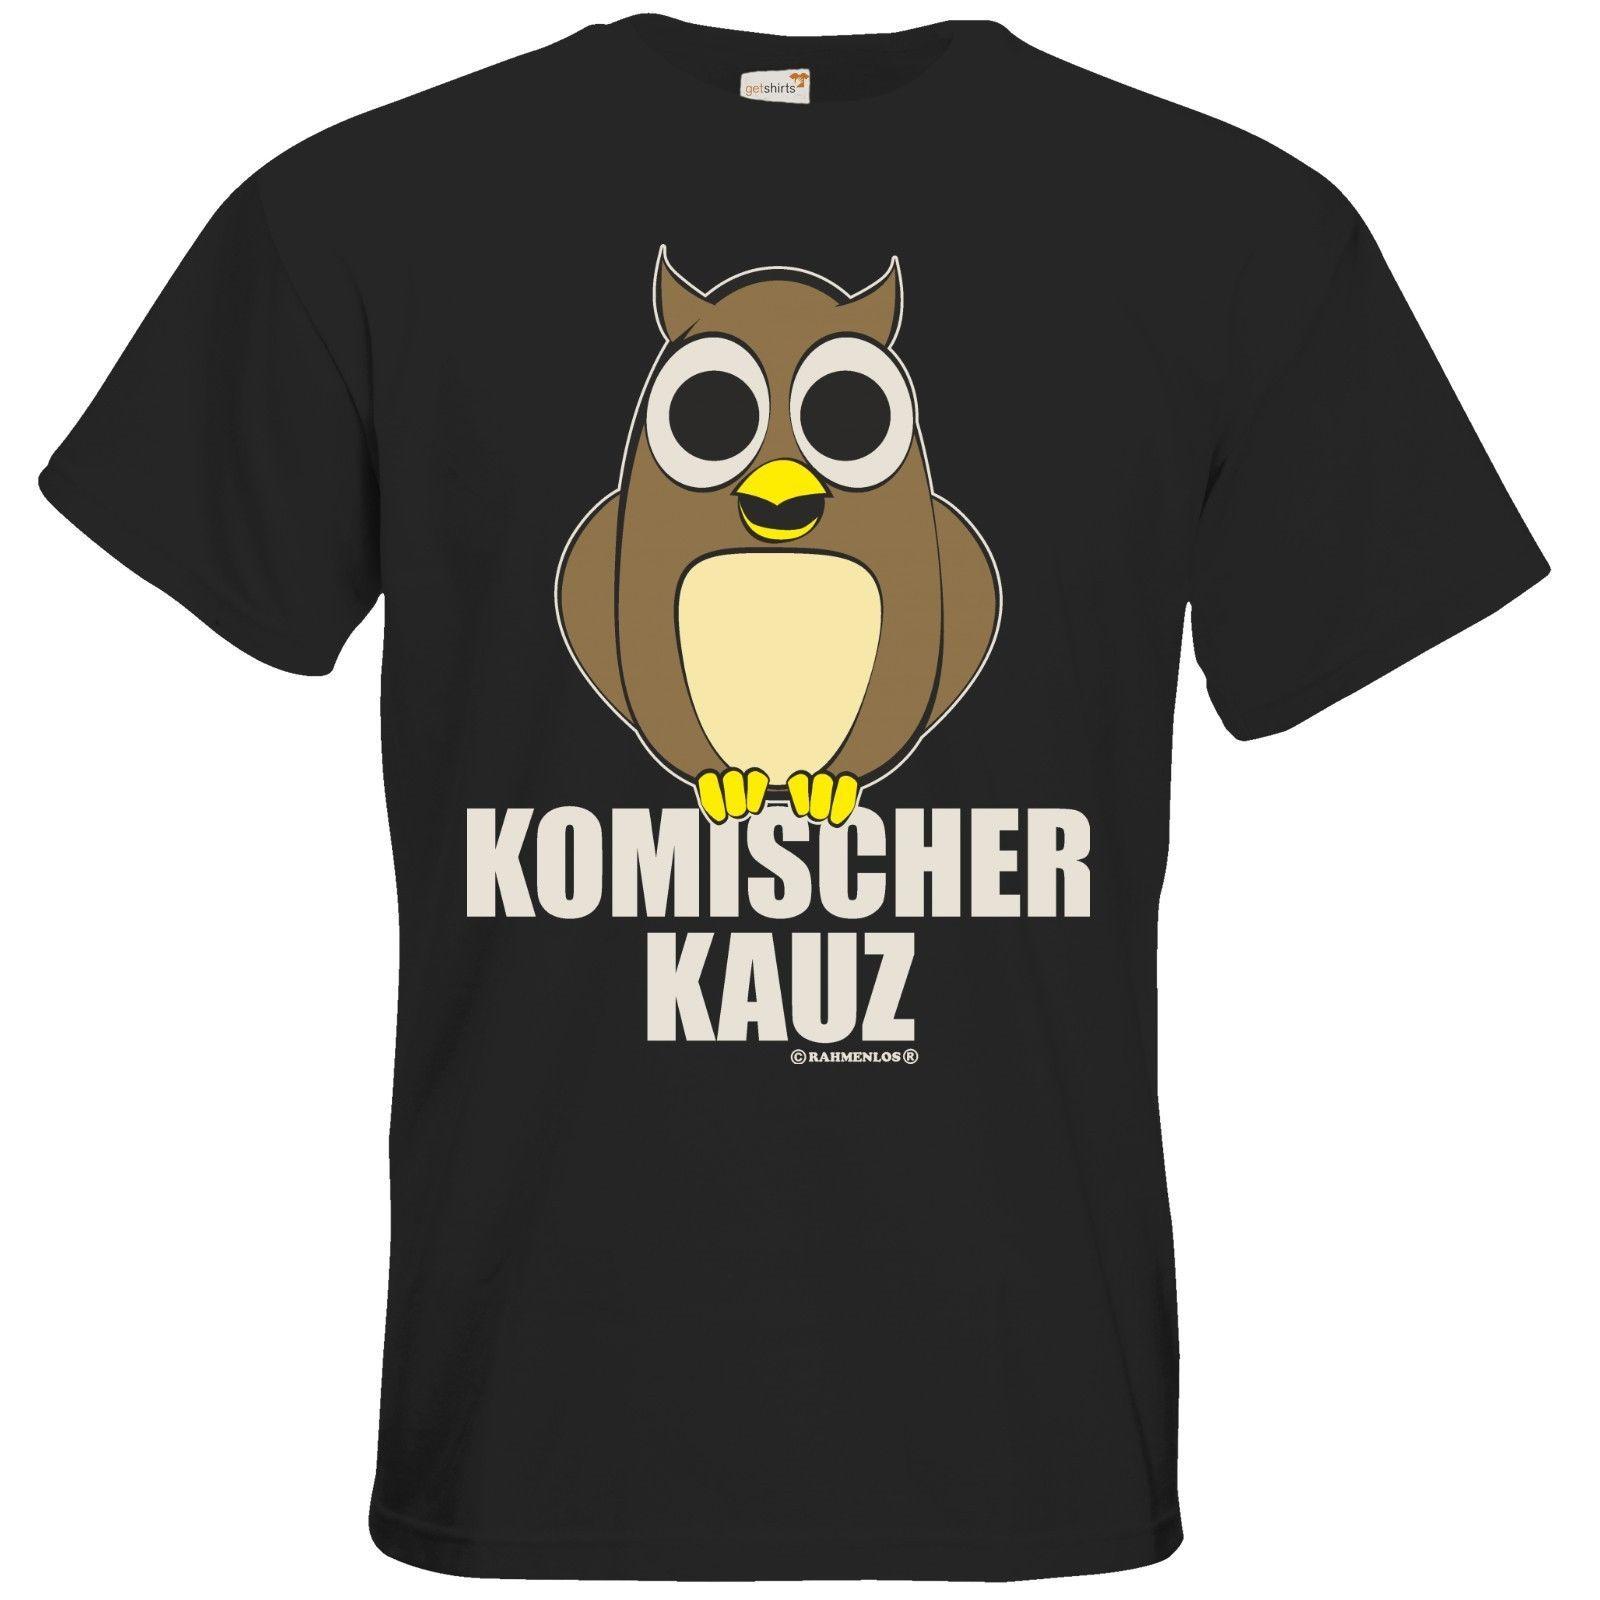 47fcc7d9e TShirt Fun Komischer Kauz Mens 2018 Fashion Brand T Shirt O-Neck 100%cotton  T-Shirt Tops Tee Custom Environmental Online with $12.99/Piece on ...